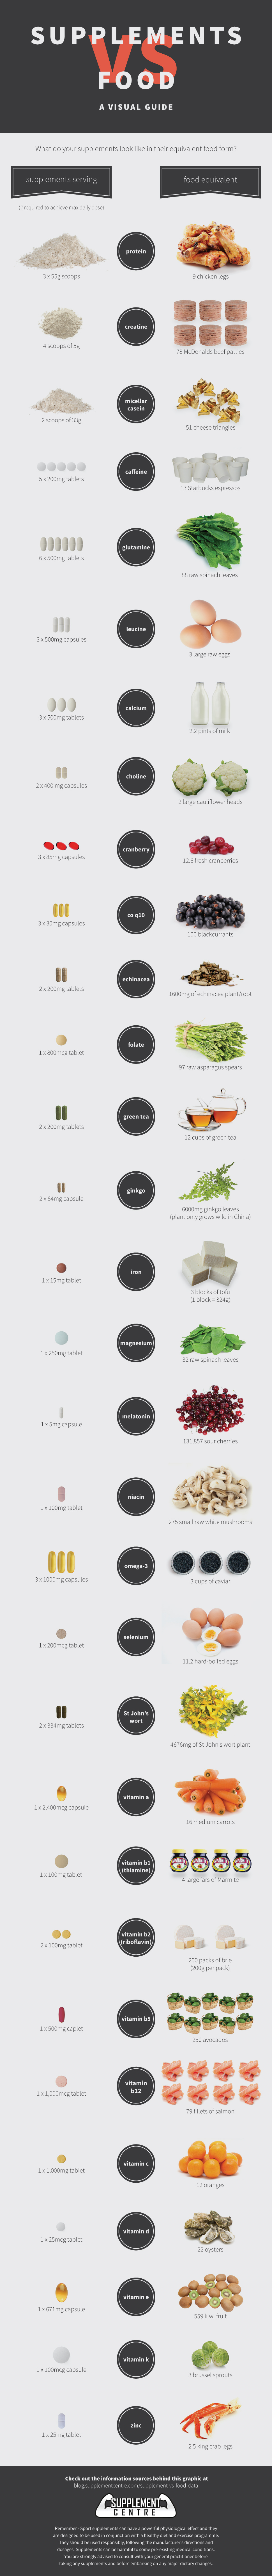 supplements-vs-food-final-version.jpg